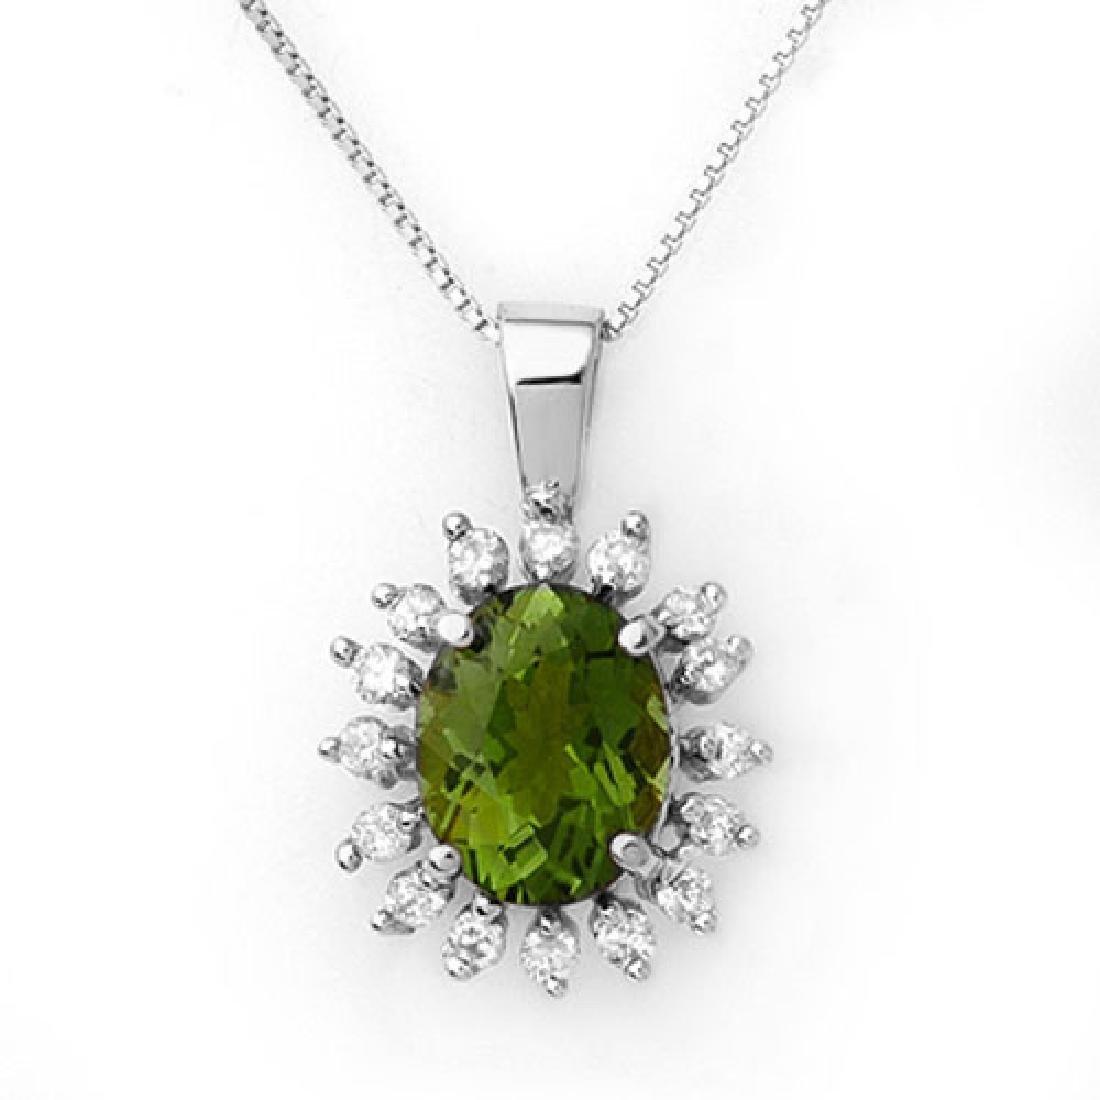 3.55 CTW Green Tourmaline & Diamond Necklace 18K White